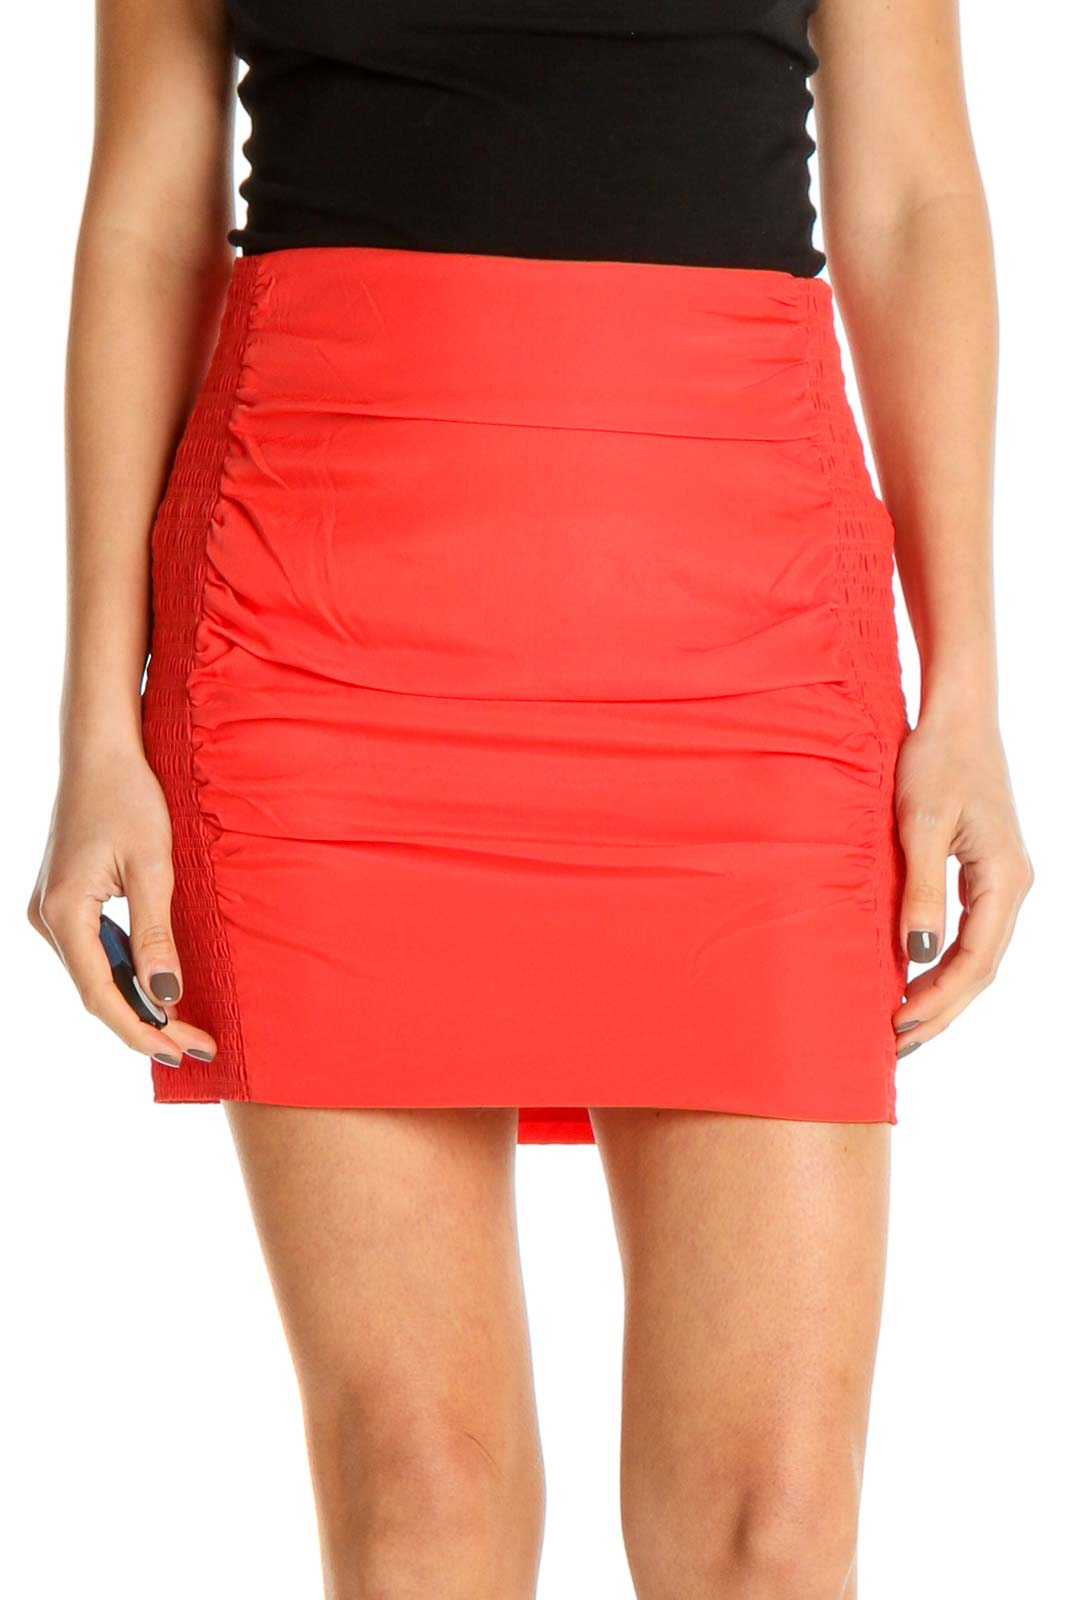 Orange Chic Pencil Skirt Front